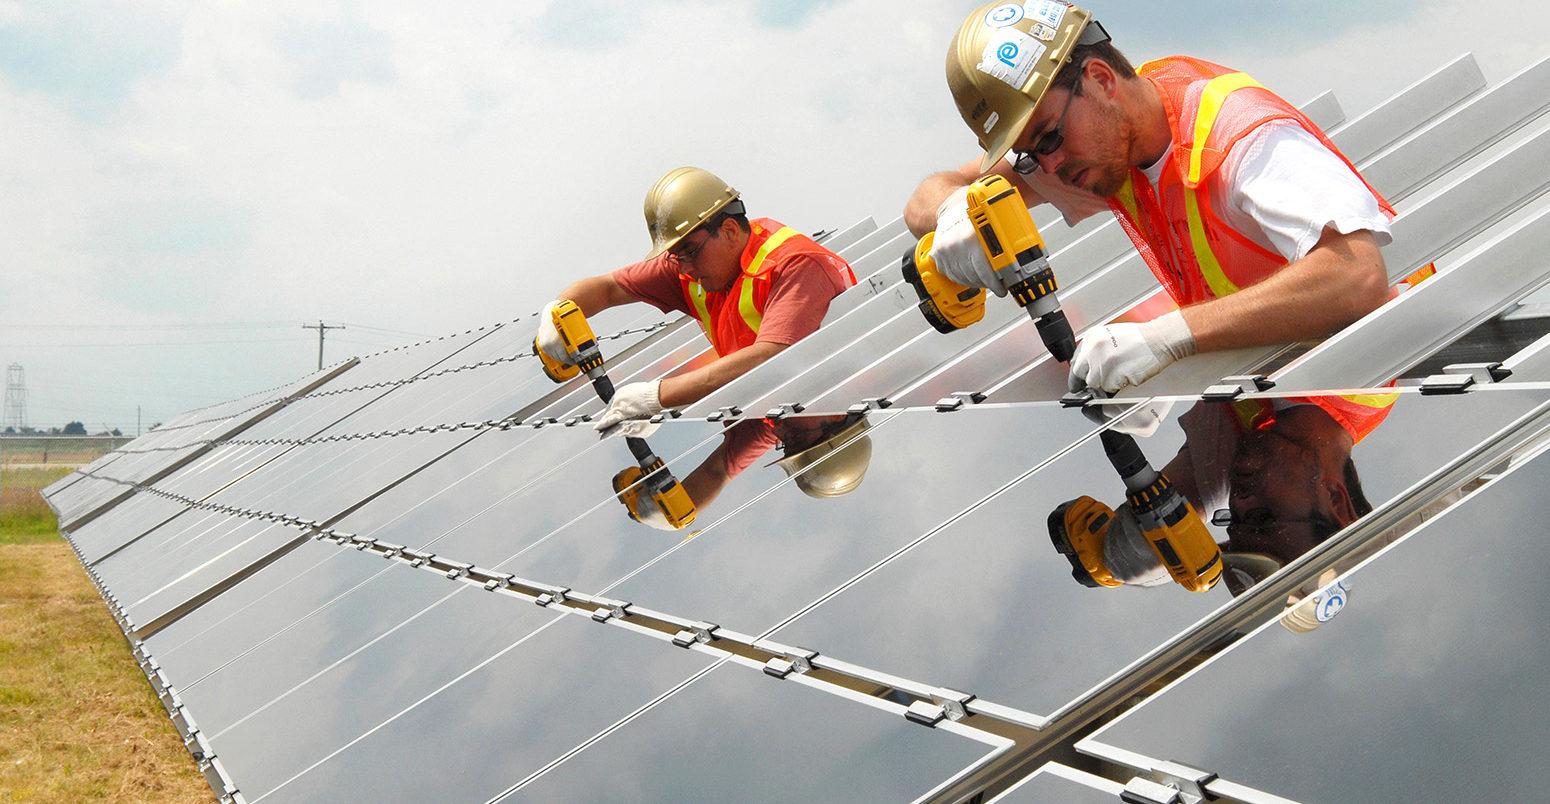 Construction of 175 acre Solar Farm; Contractor: M Sullivan & Sons; owner EDF EN Canada, EDG-Engeries Nouvelles, West Carleton Solar Farm; Galetta Sid